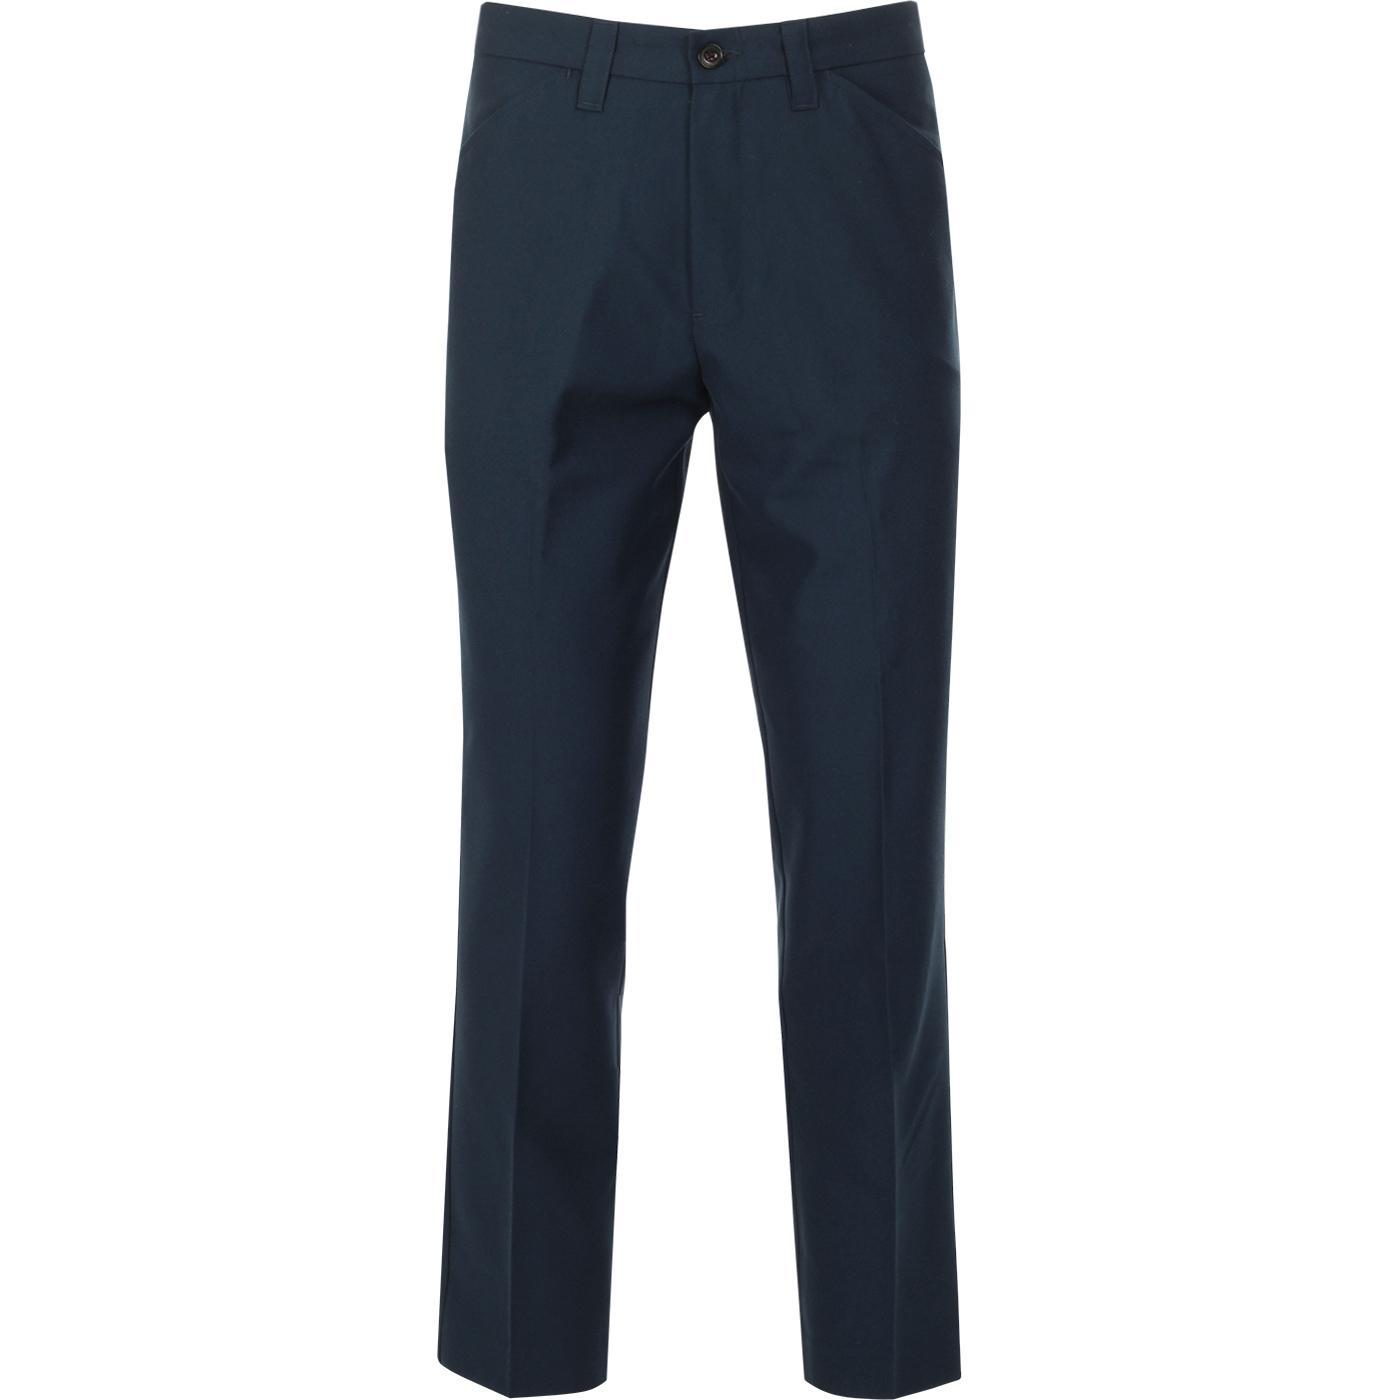 FARAH 100 Original Hopsack Weave Mod Trousers (T)